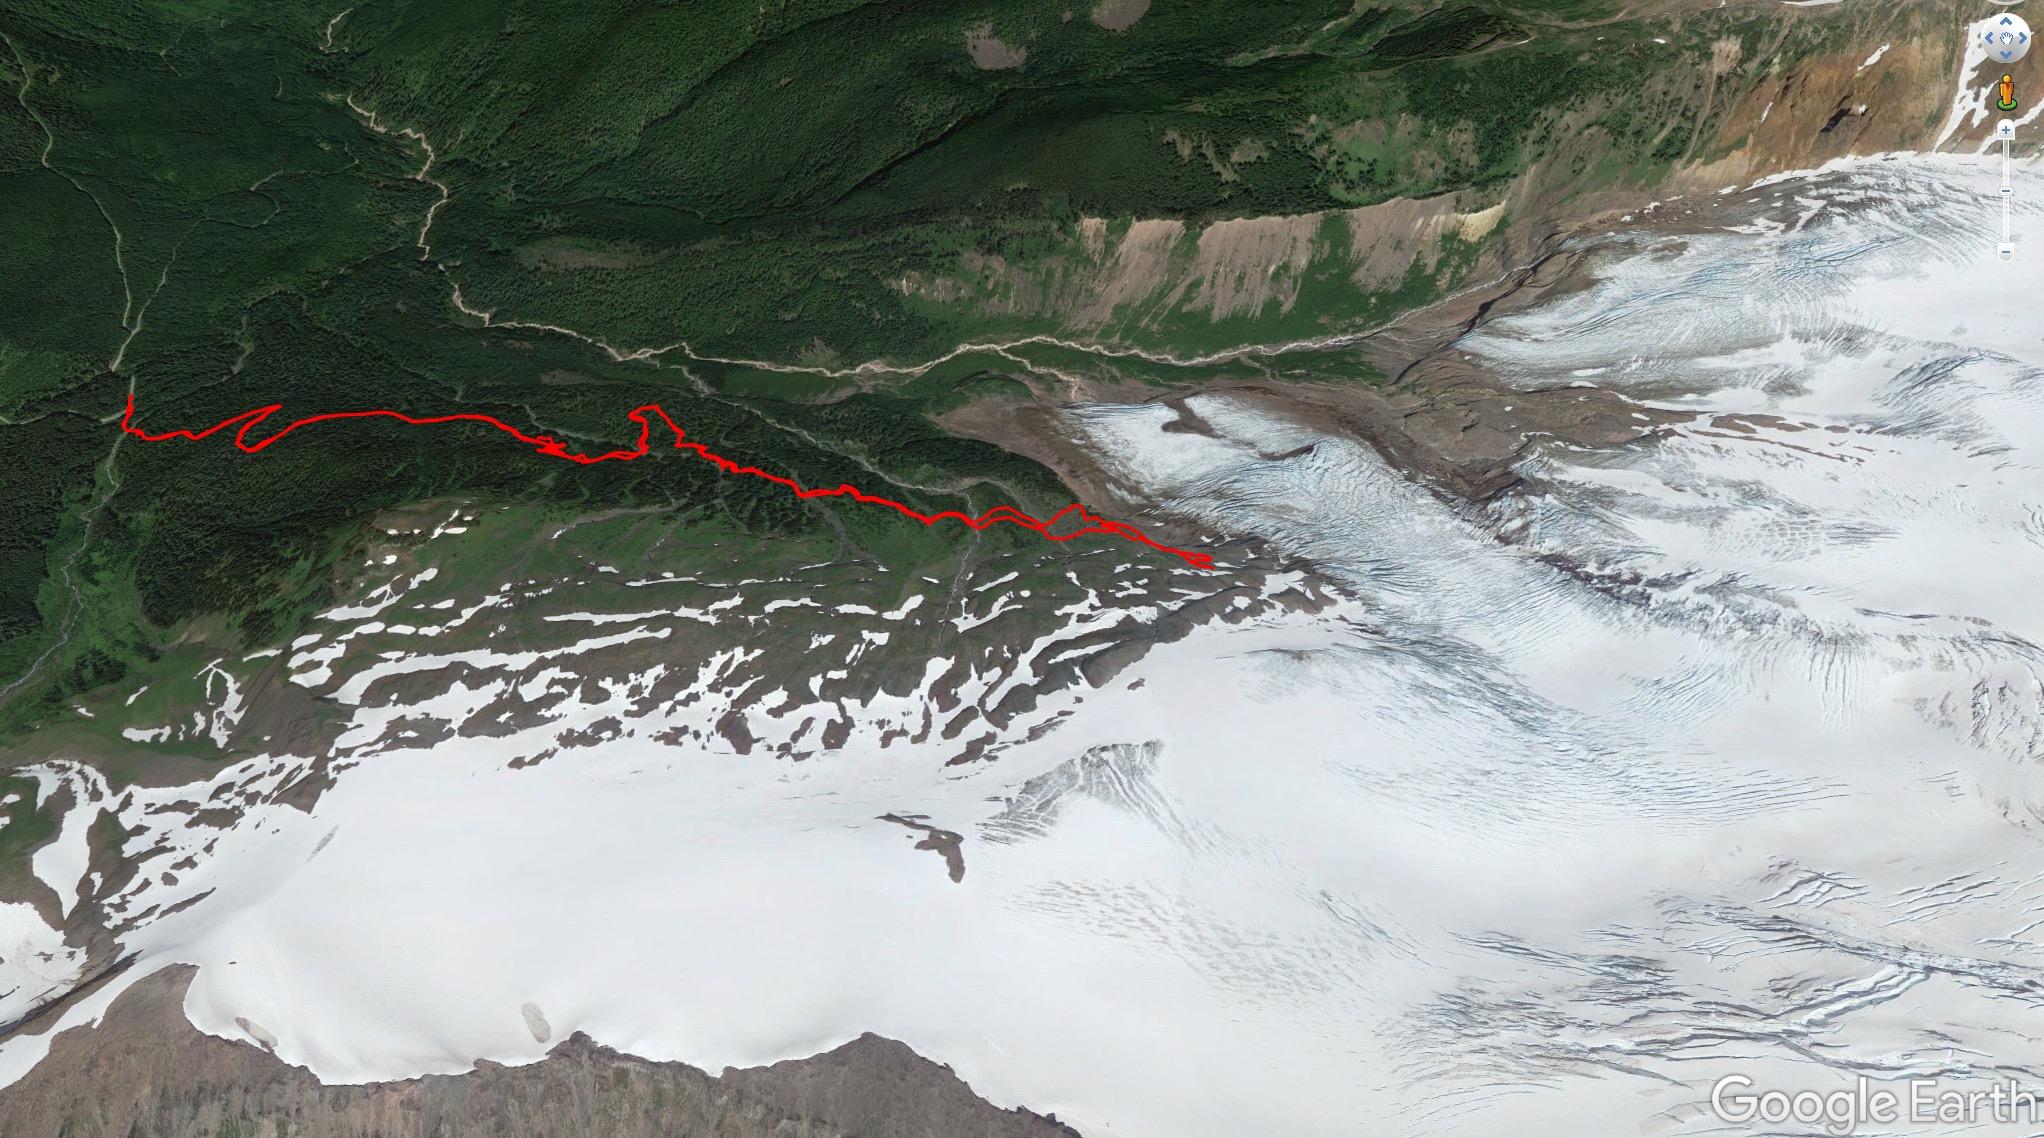 Our hike up the Heliotrope Ridge Trail